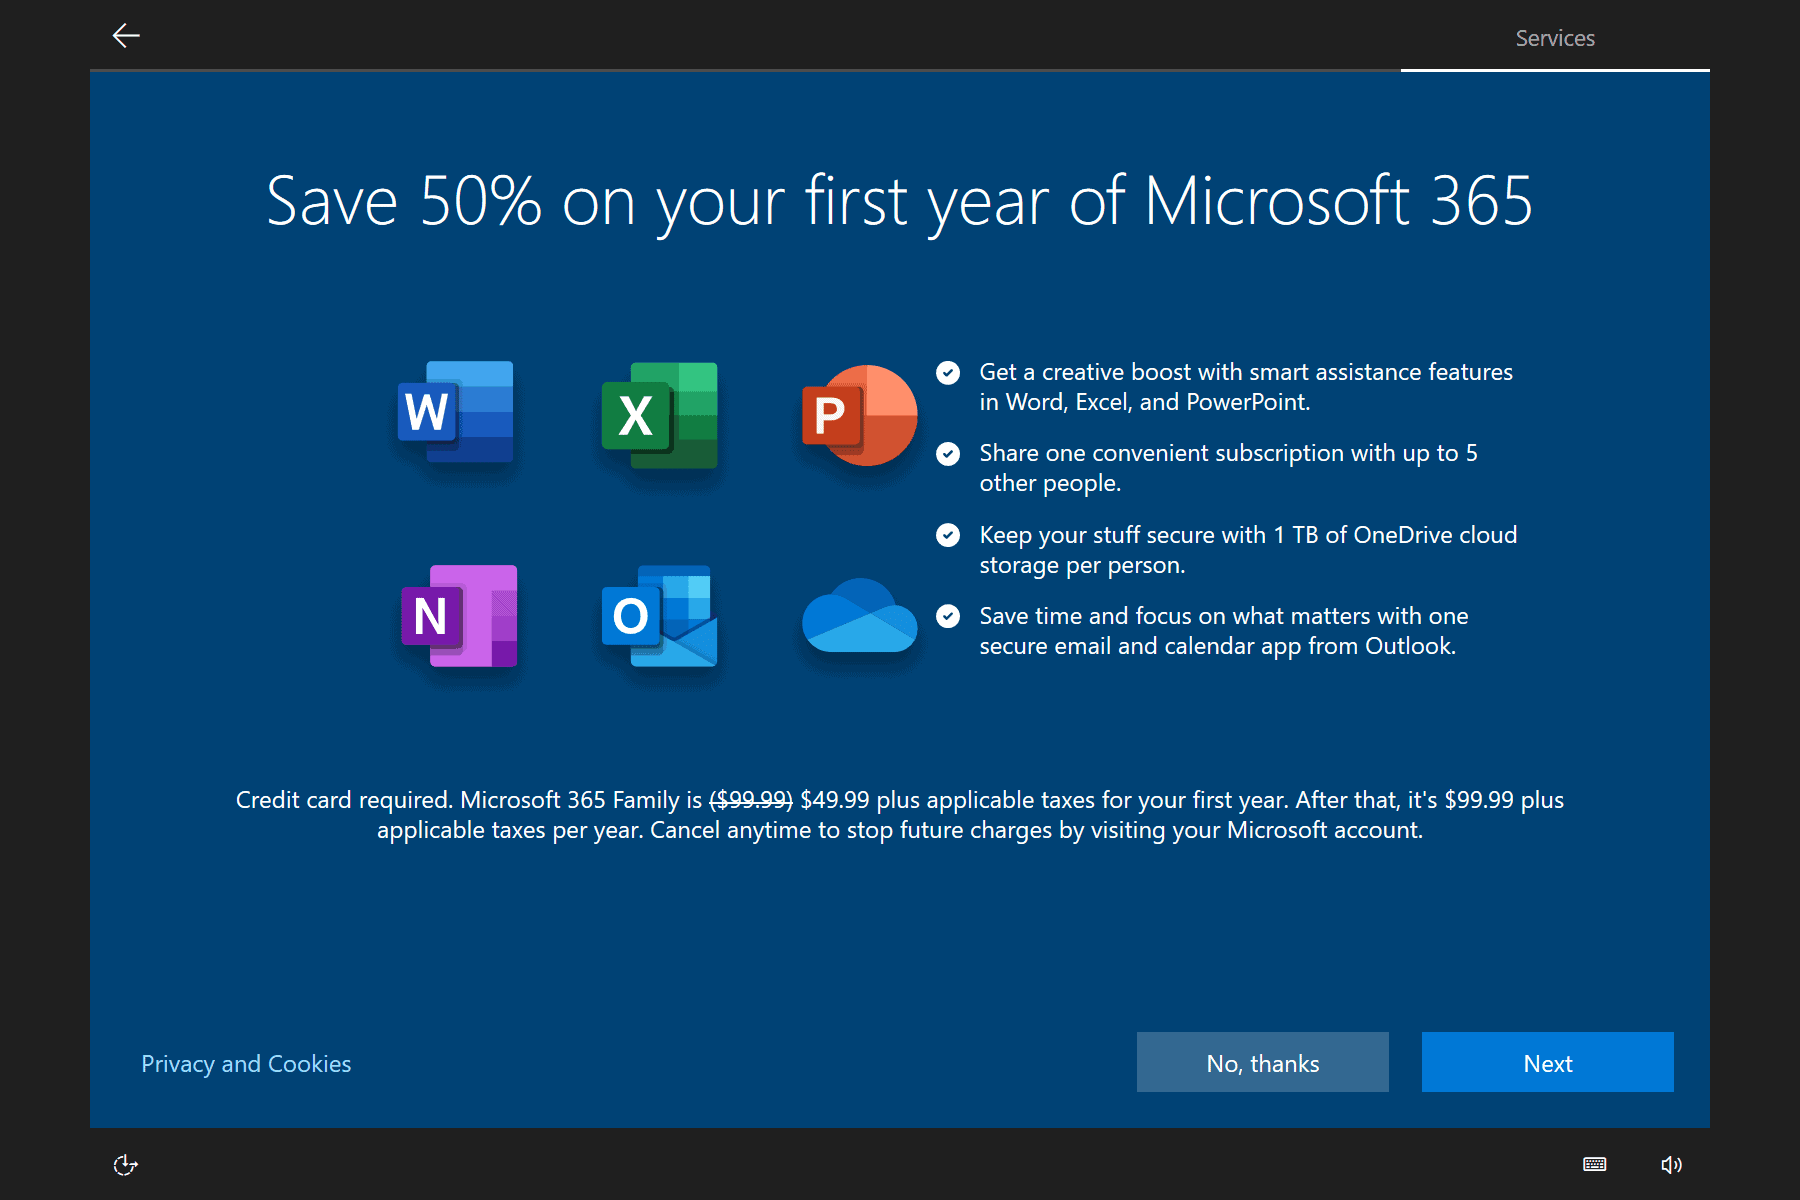 Microsoft 365 Advertising